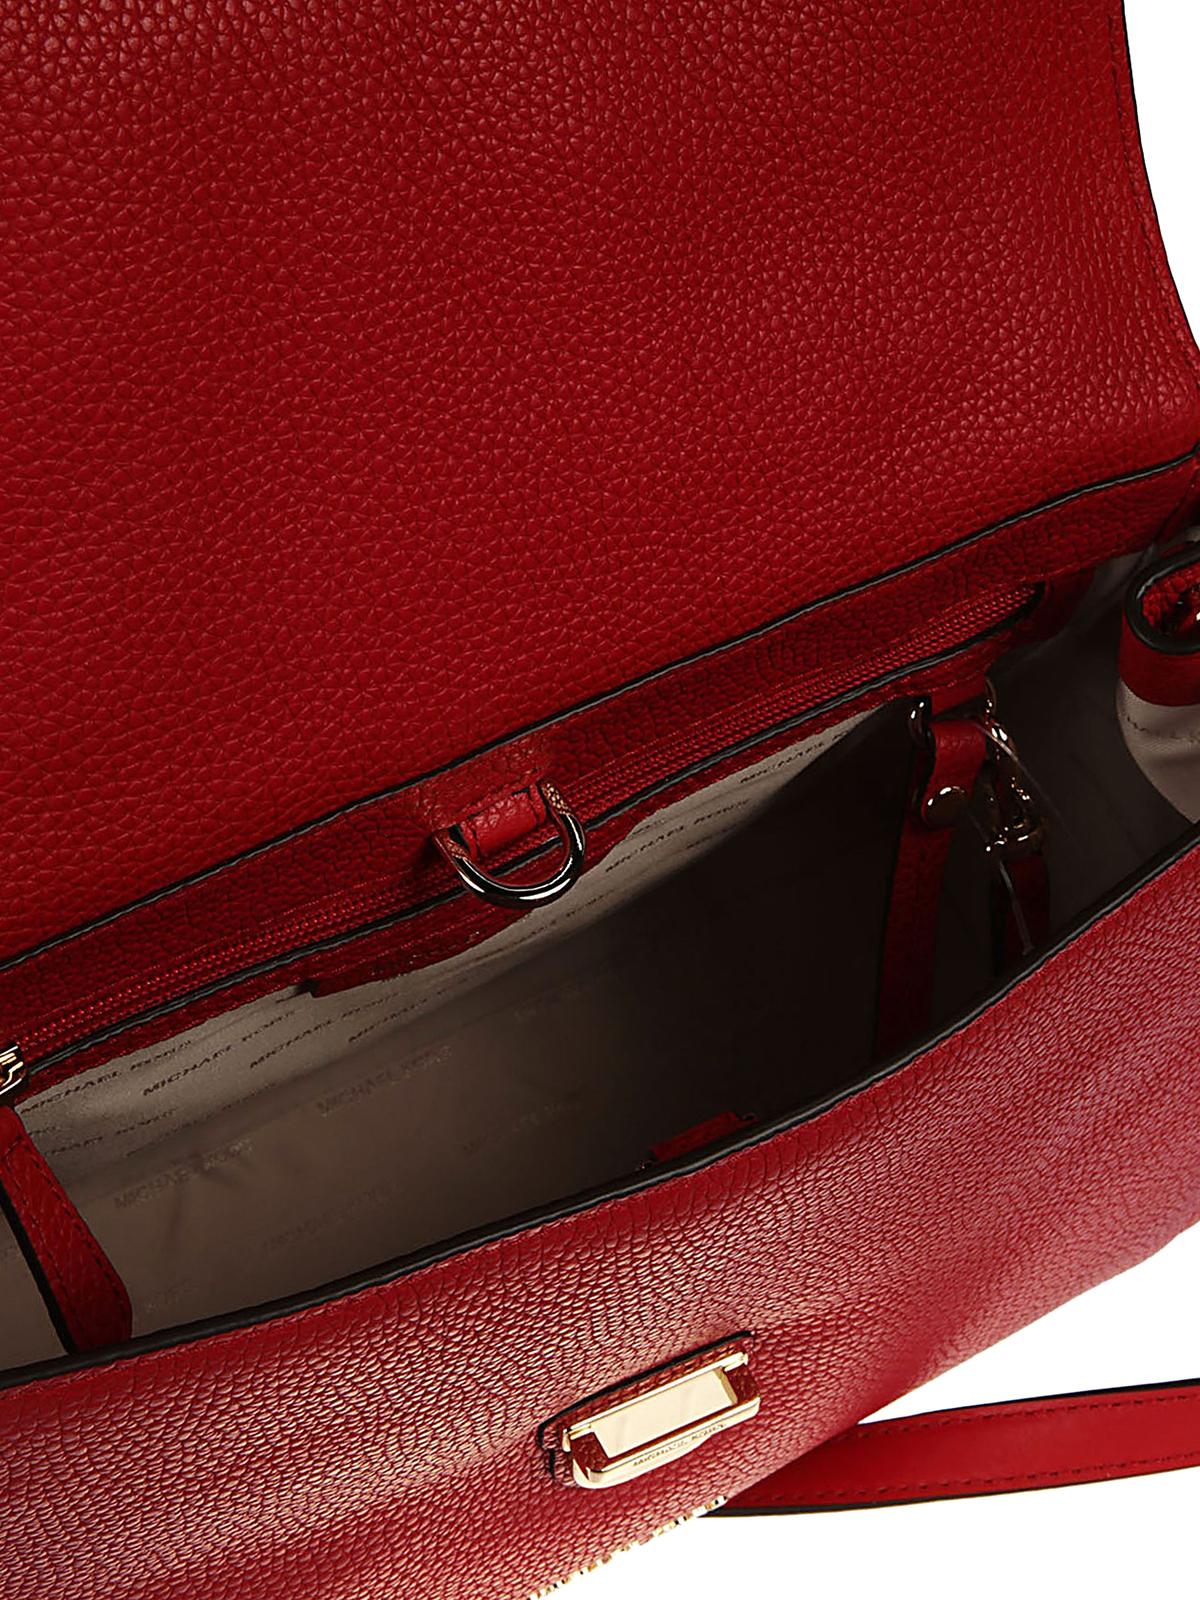 40fd8335b75a MICHAEL KORS buy online Bristol leather bag. MICHAEL KORS: bowling bags ...